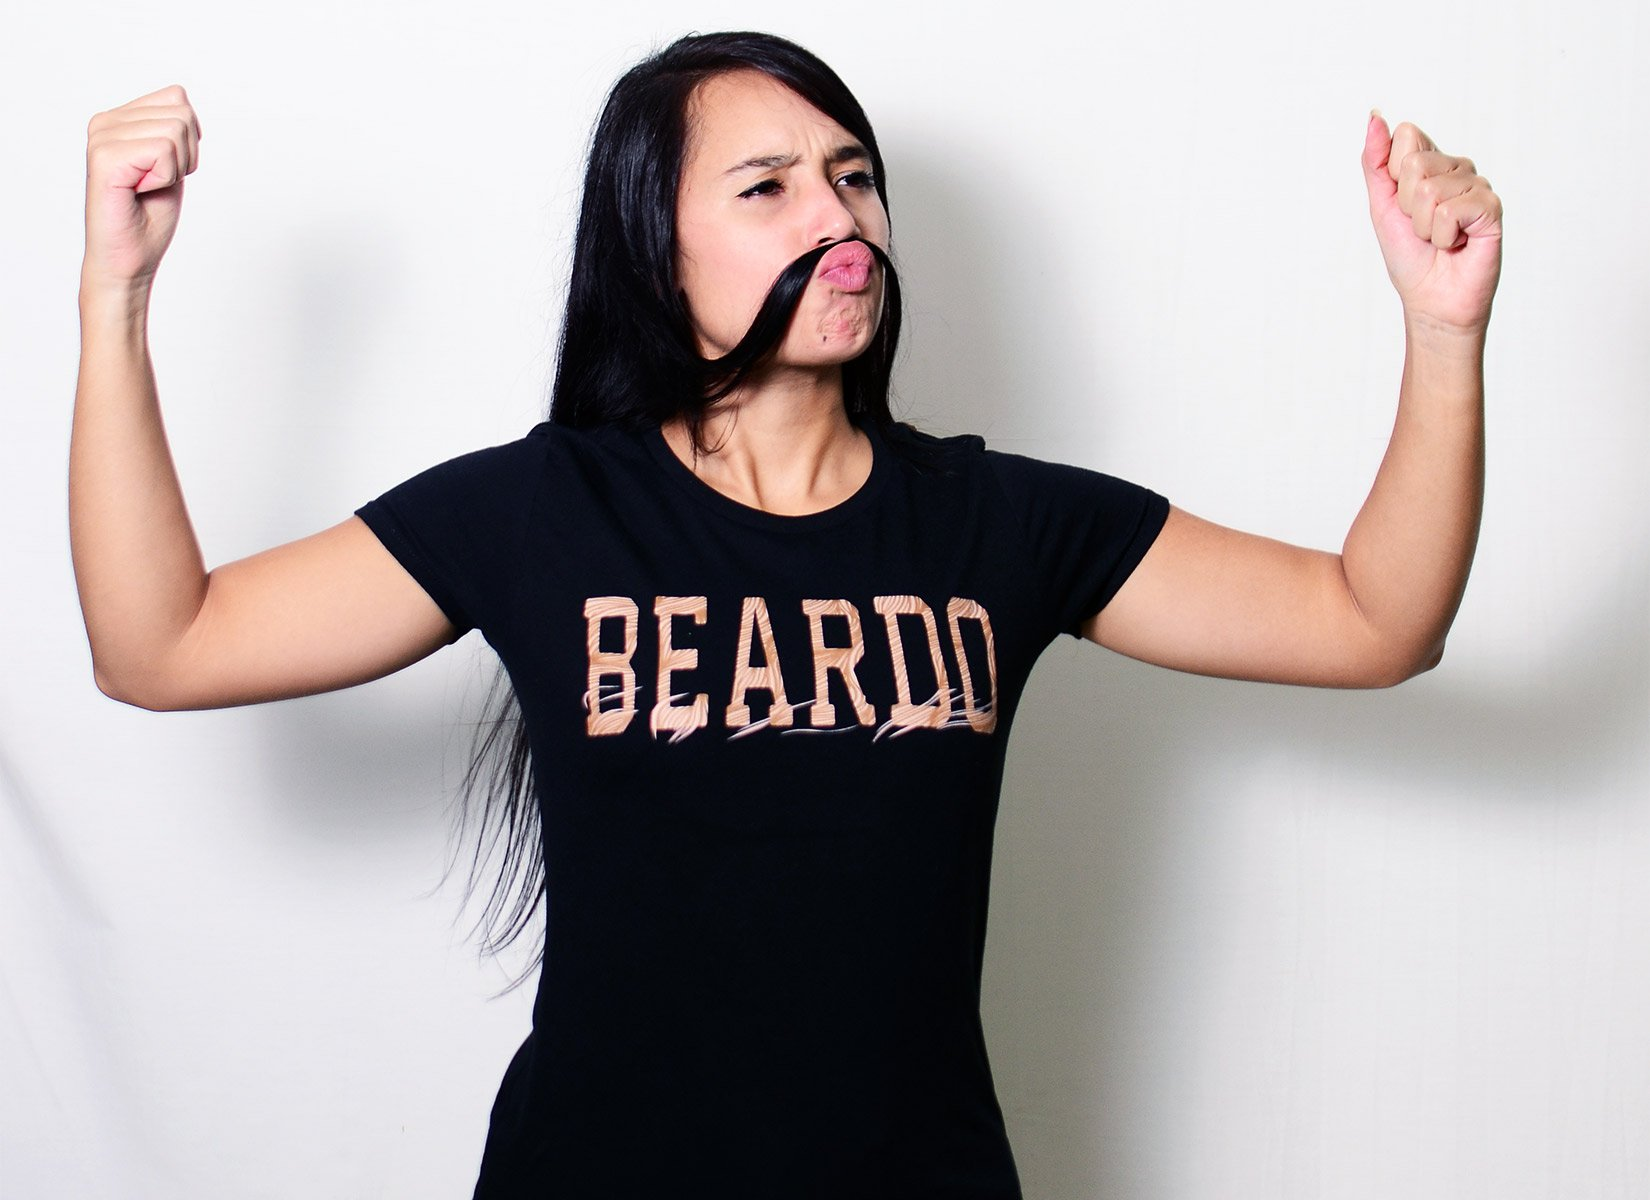 Beardo on Womens T-Shirt